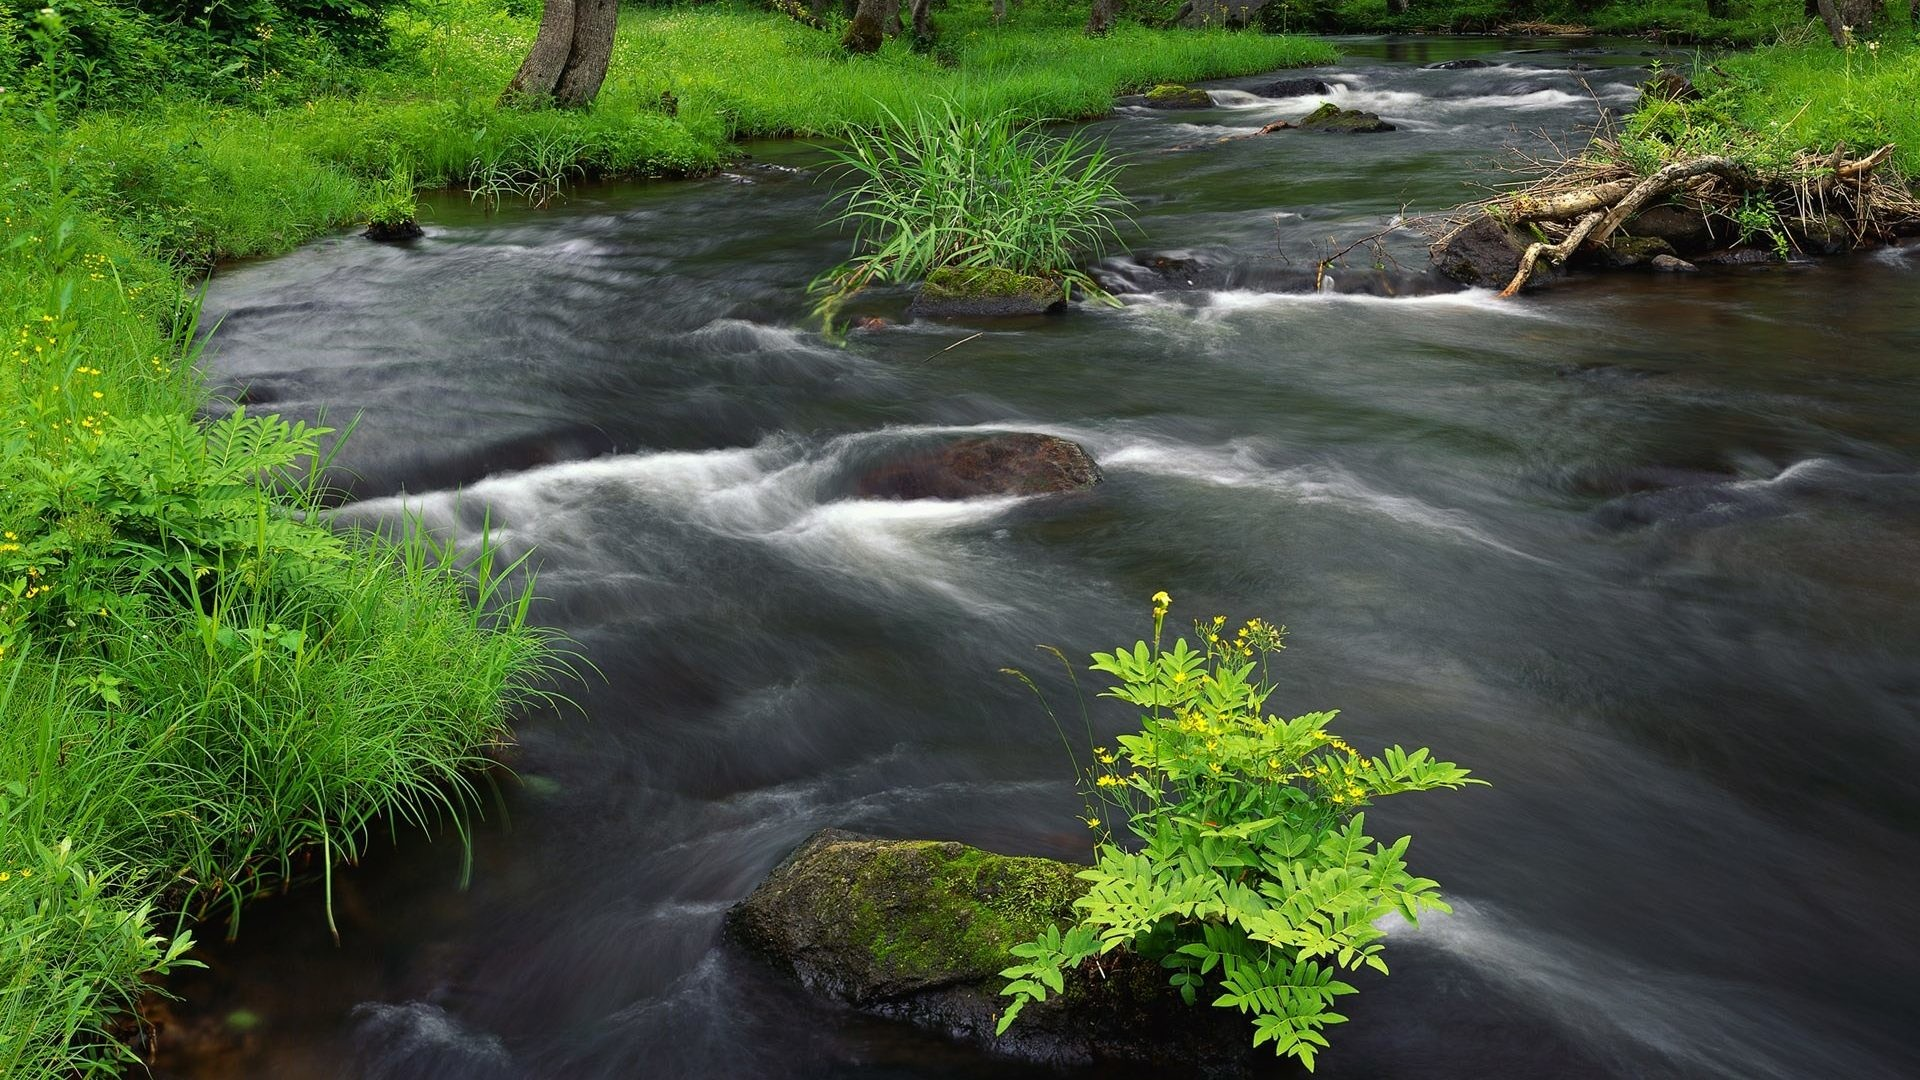 FOREST STREAM JAPAN Landscape Japanese Digital Scenery Photography HDR  Wallpaper – 1920×1440